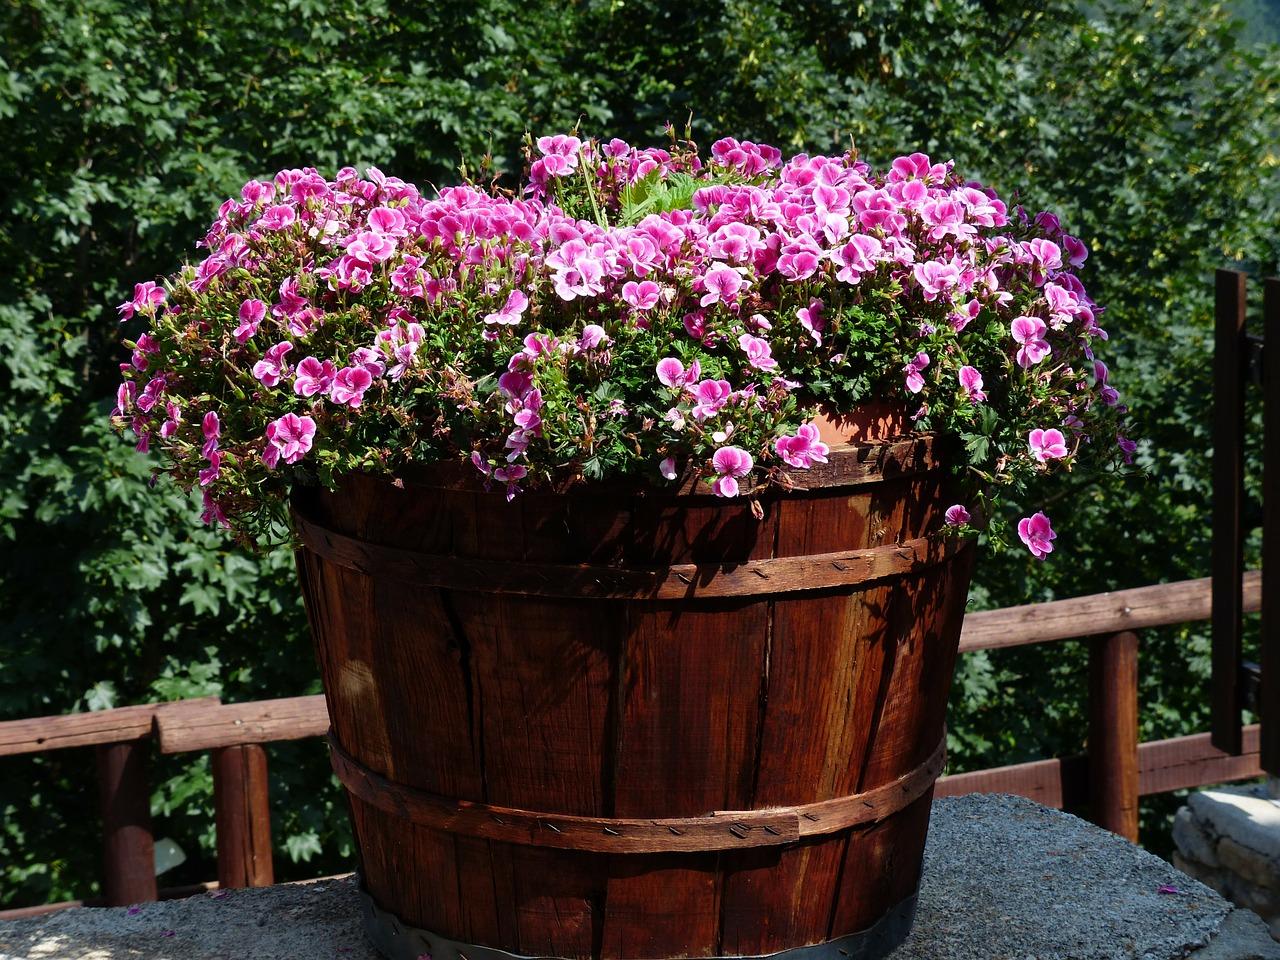 flowers-177389_1280